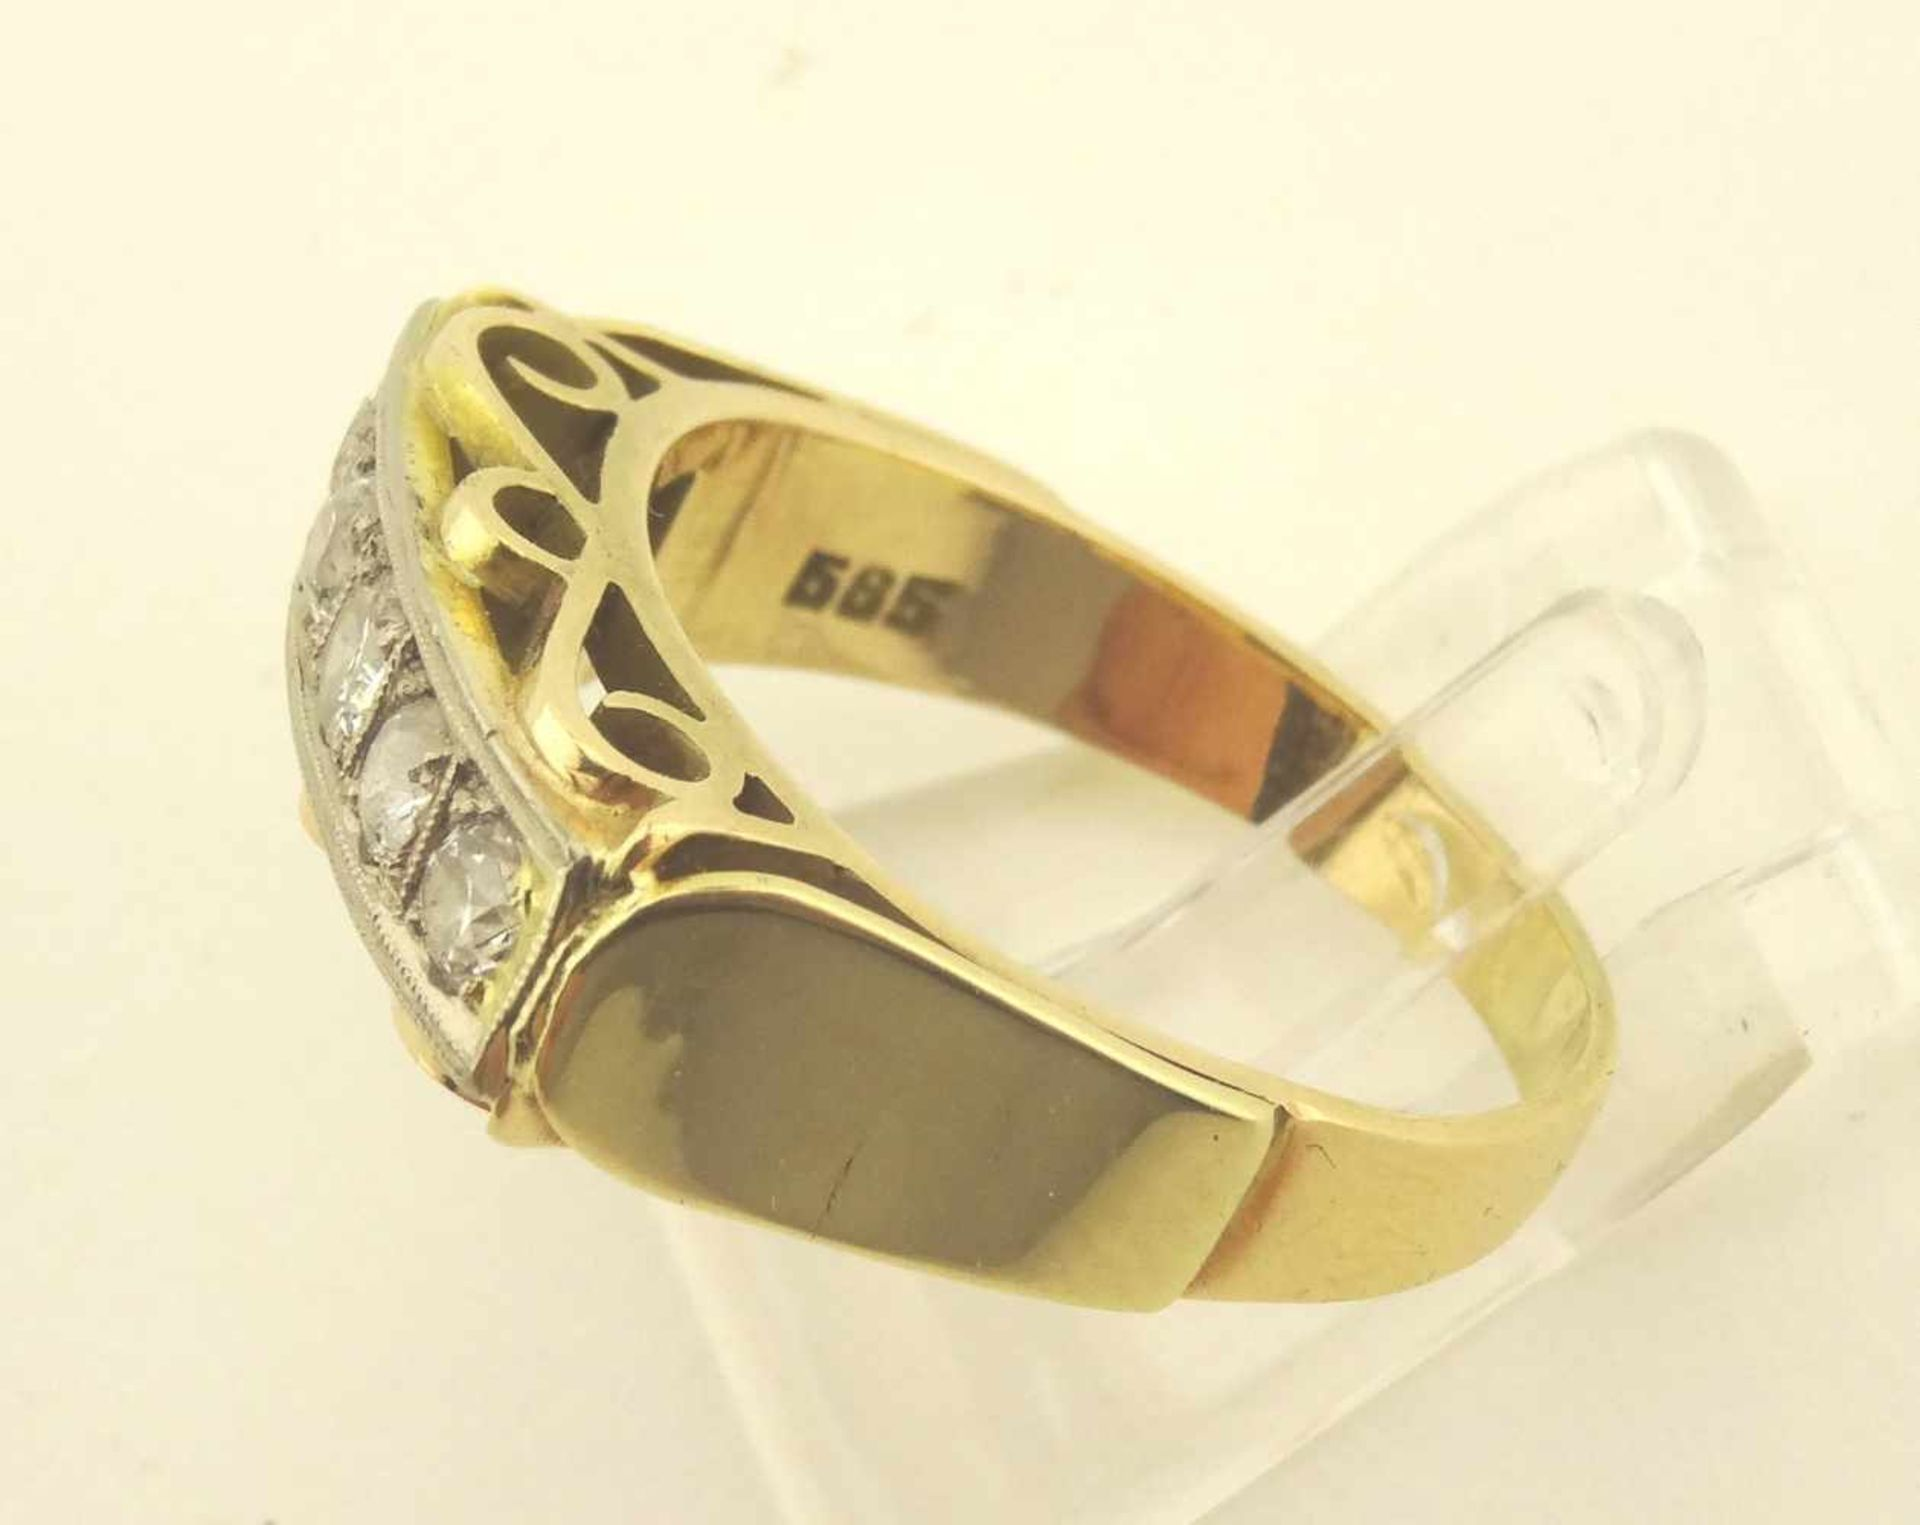 Los 13 - Brillantring 585 Gold 2 farbig mit 5 Brillanten zus. ca. 0,25ct.w/pi 1, RG 55, Gewicht ges. ca. 4,